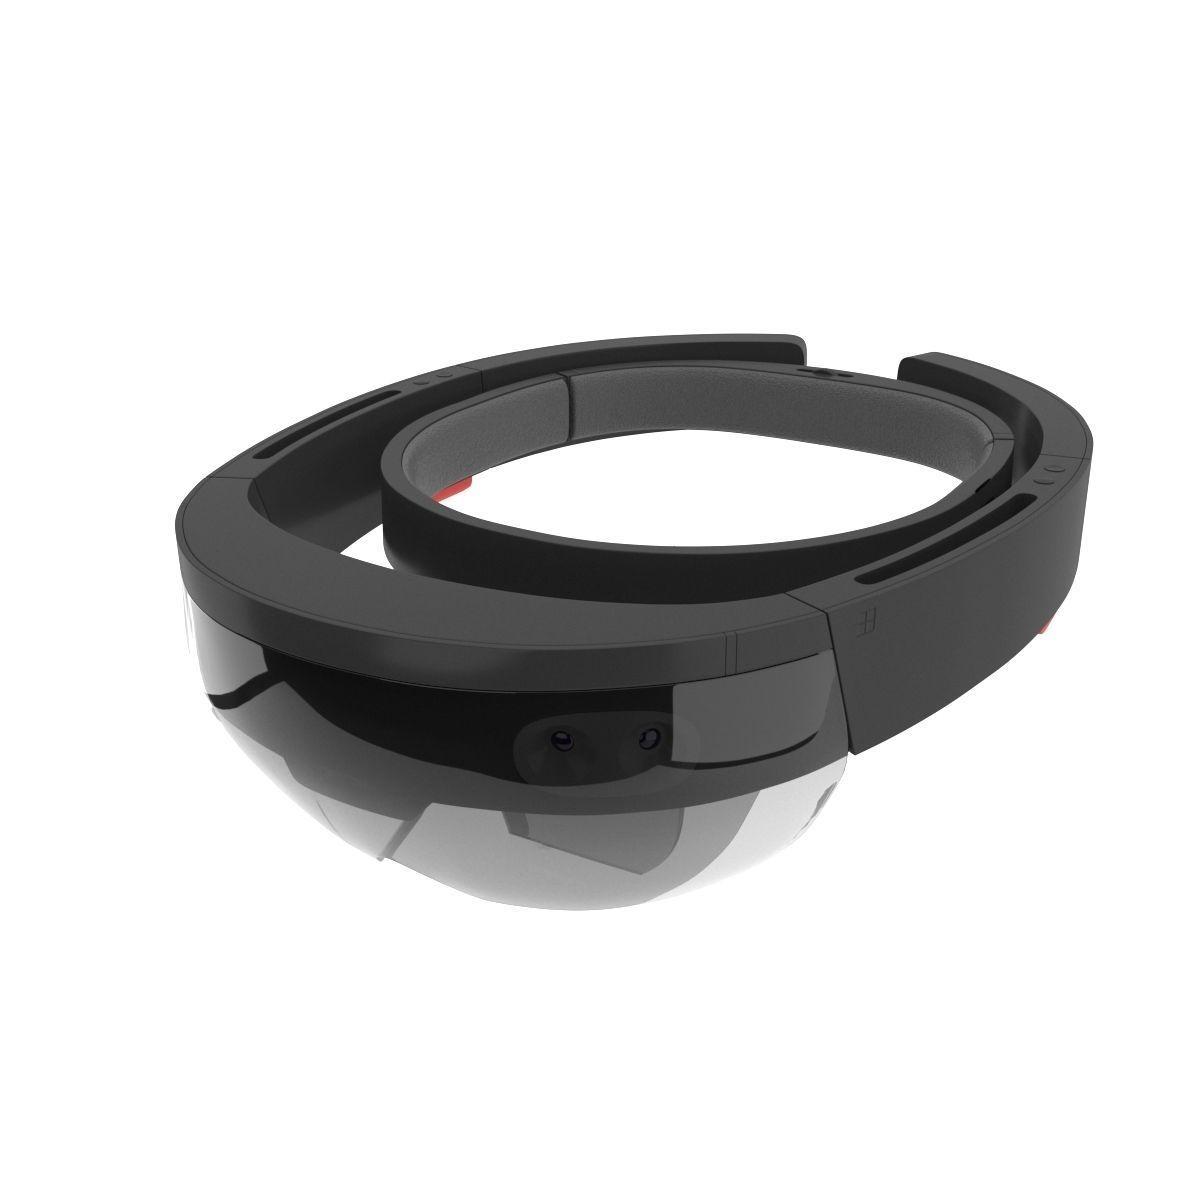 Microsoft Hololens | 3D model